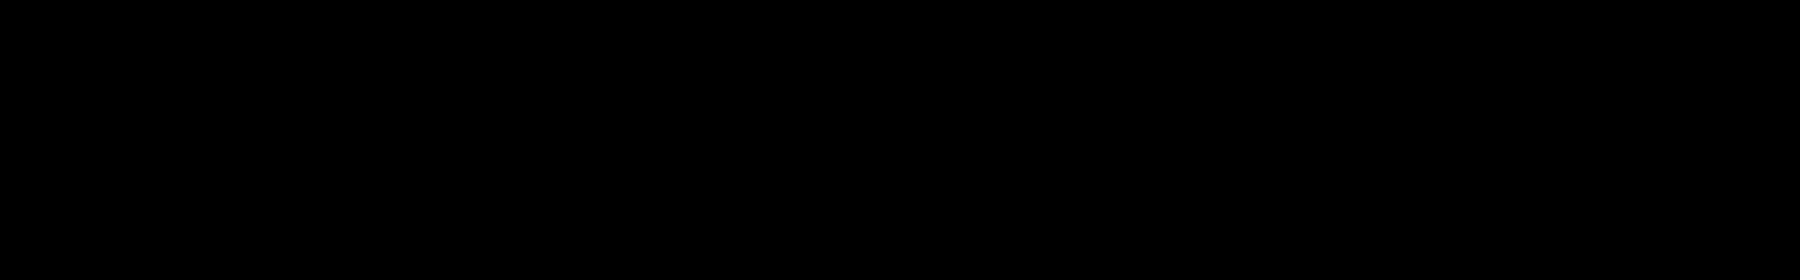 Tomorrowland EDM Drops 2 audio waveform